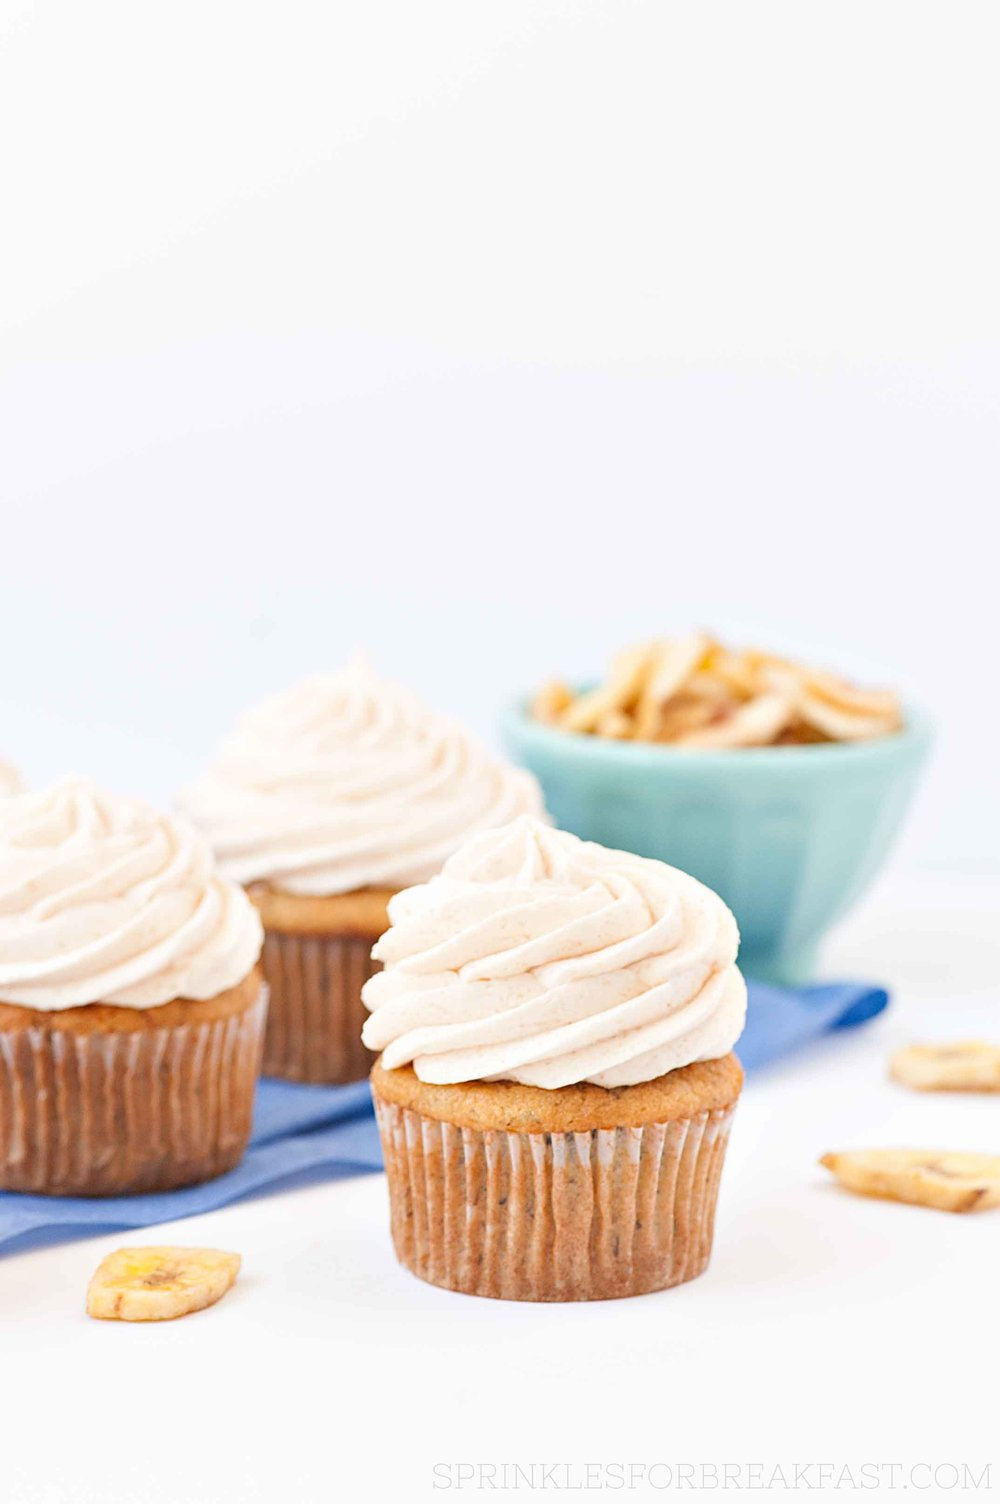 Banana Caramel Cupcakes | Sprinkles for Breakfast